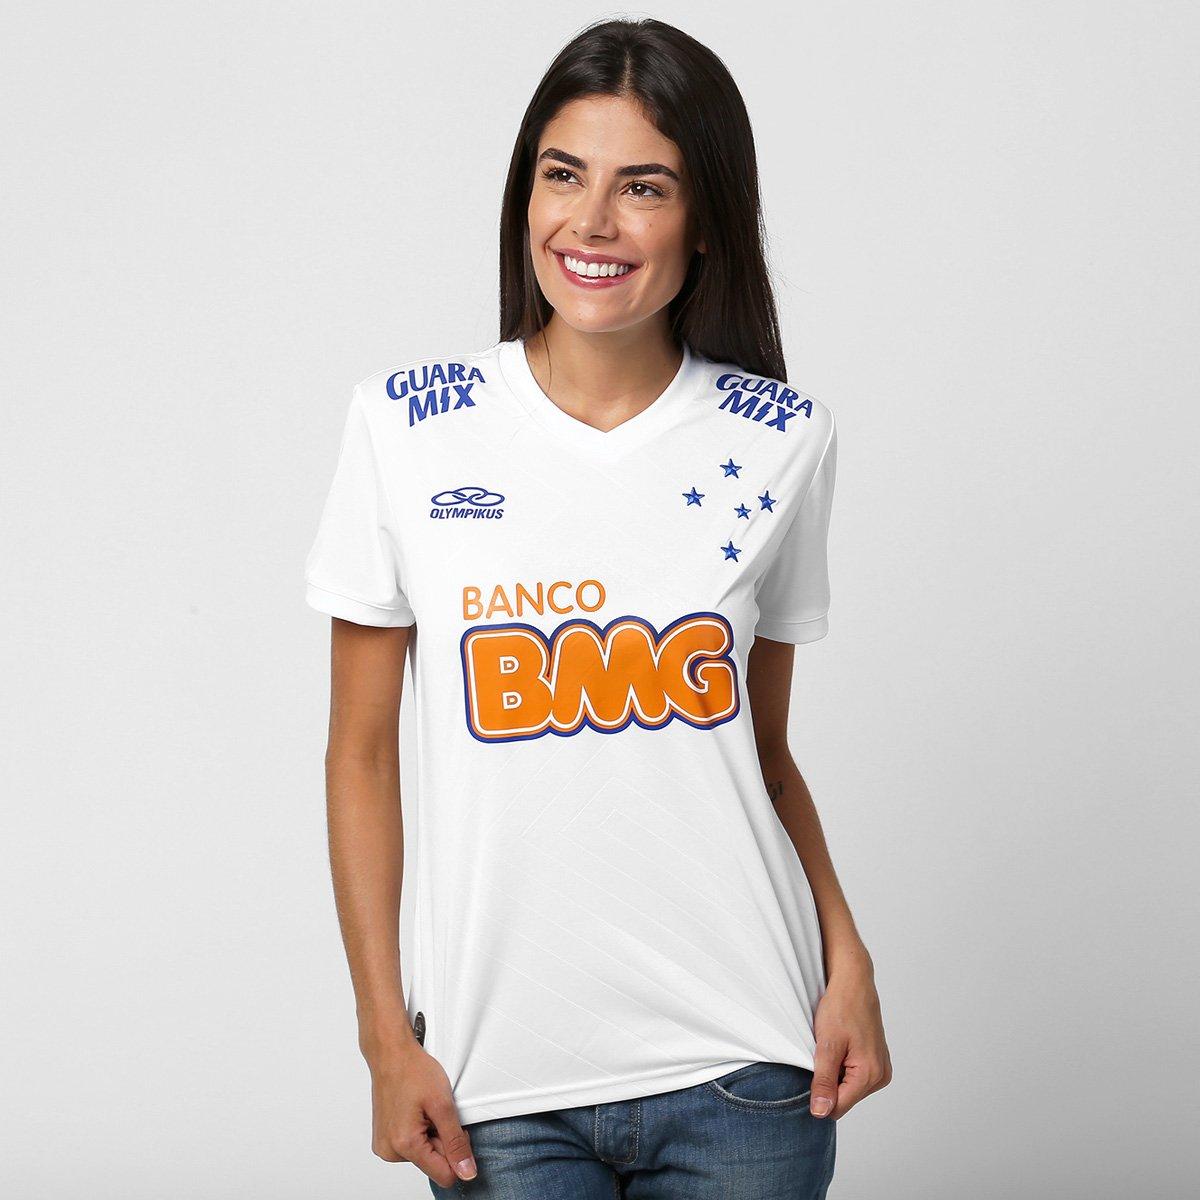 Camisa Feminina Olympikus Cruzeiro II 2014 n° 10 - Compre Agora ... b2854d82f336c